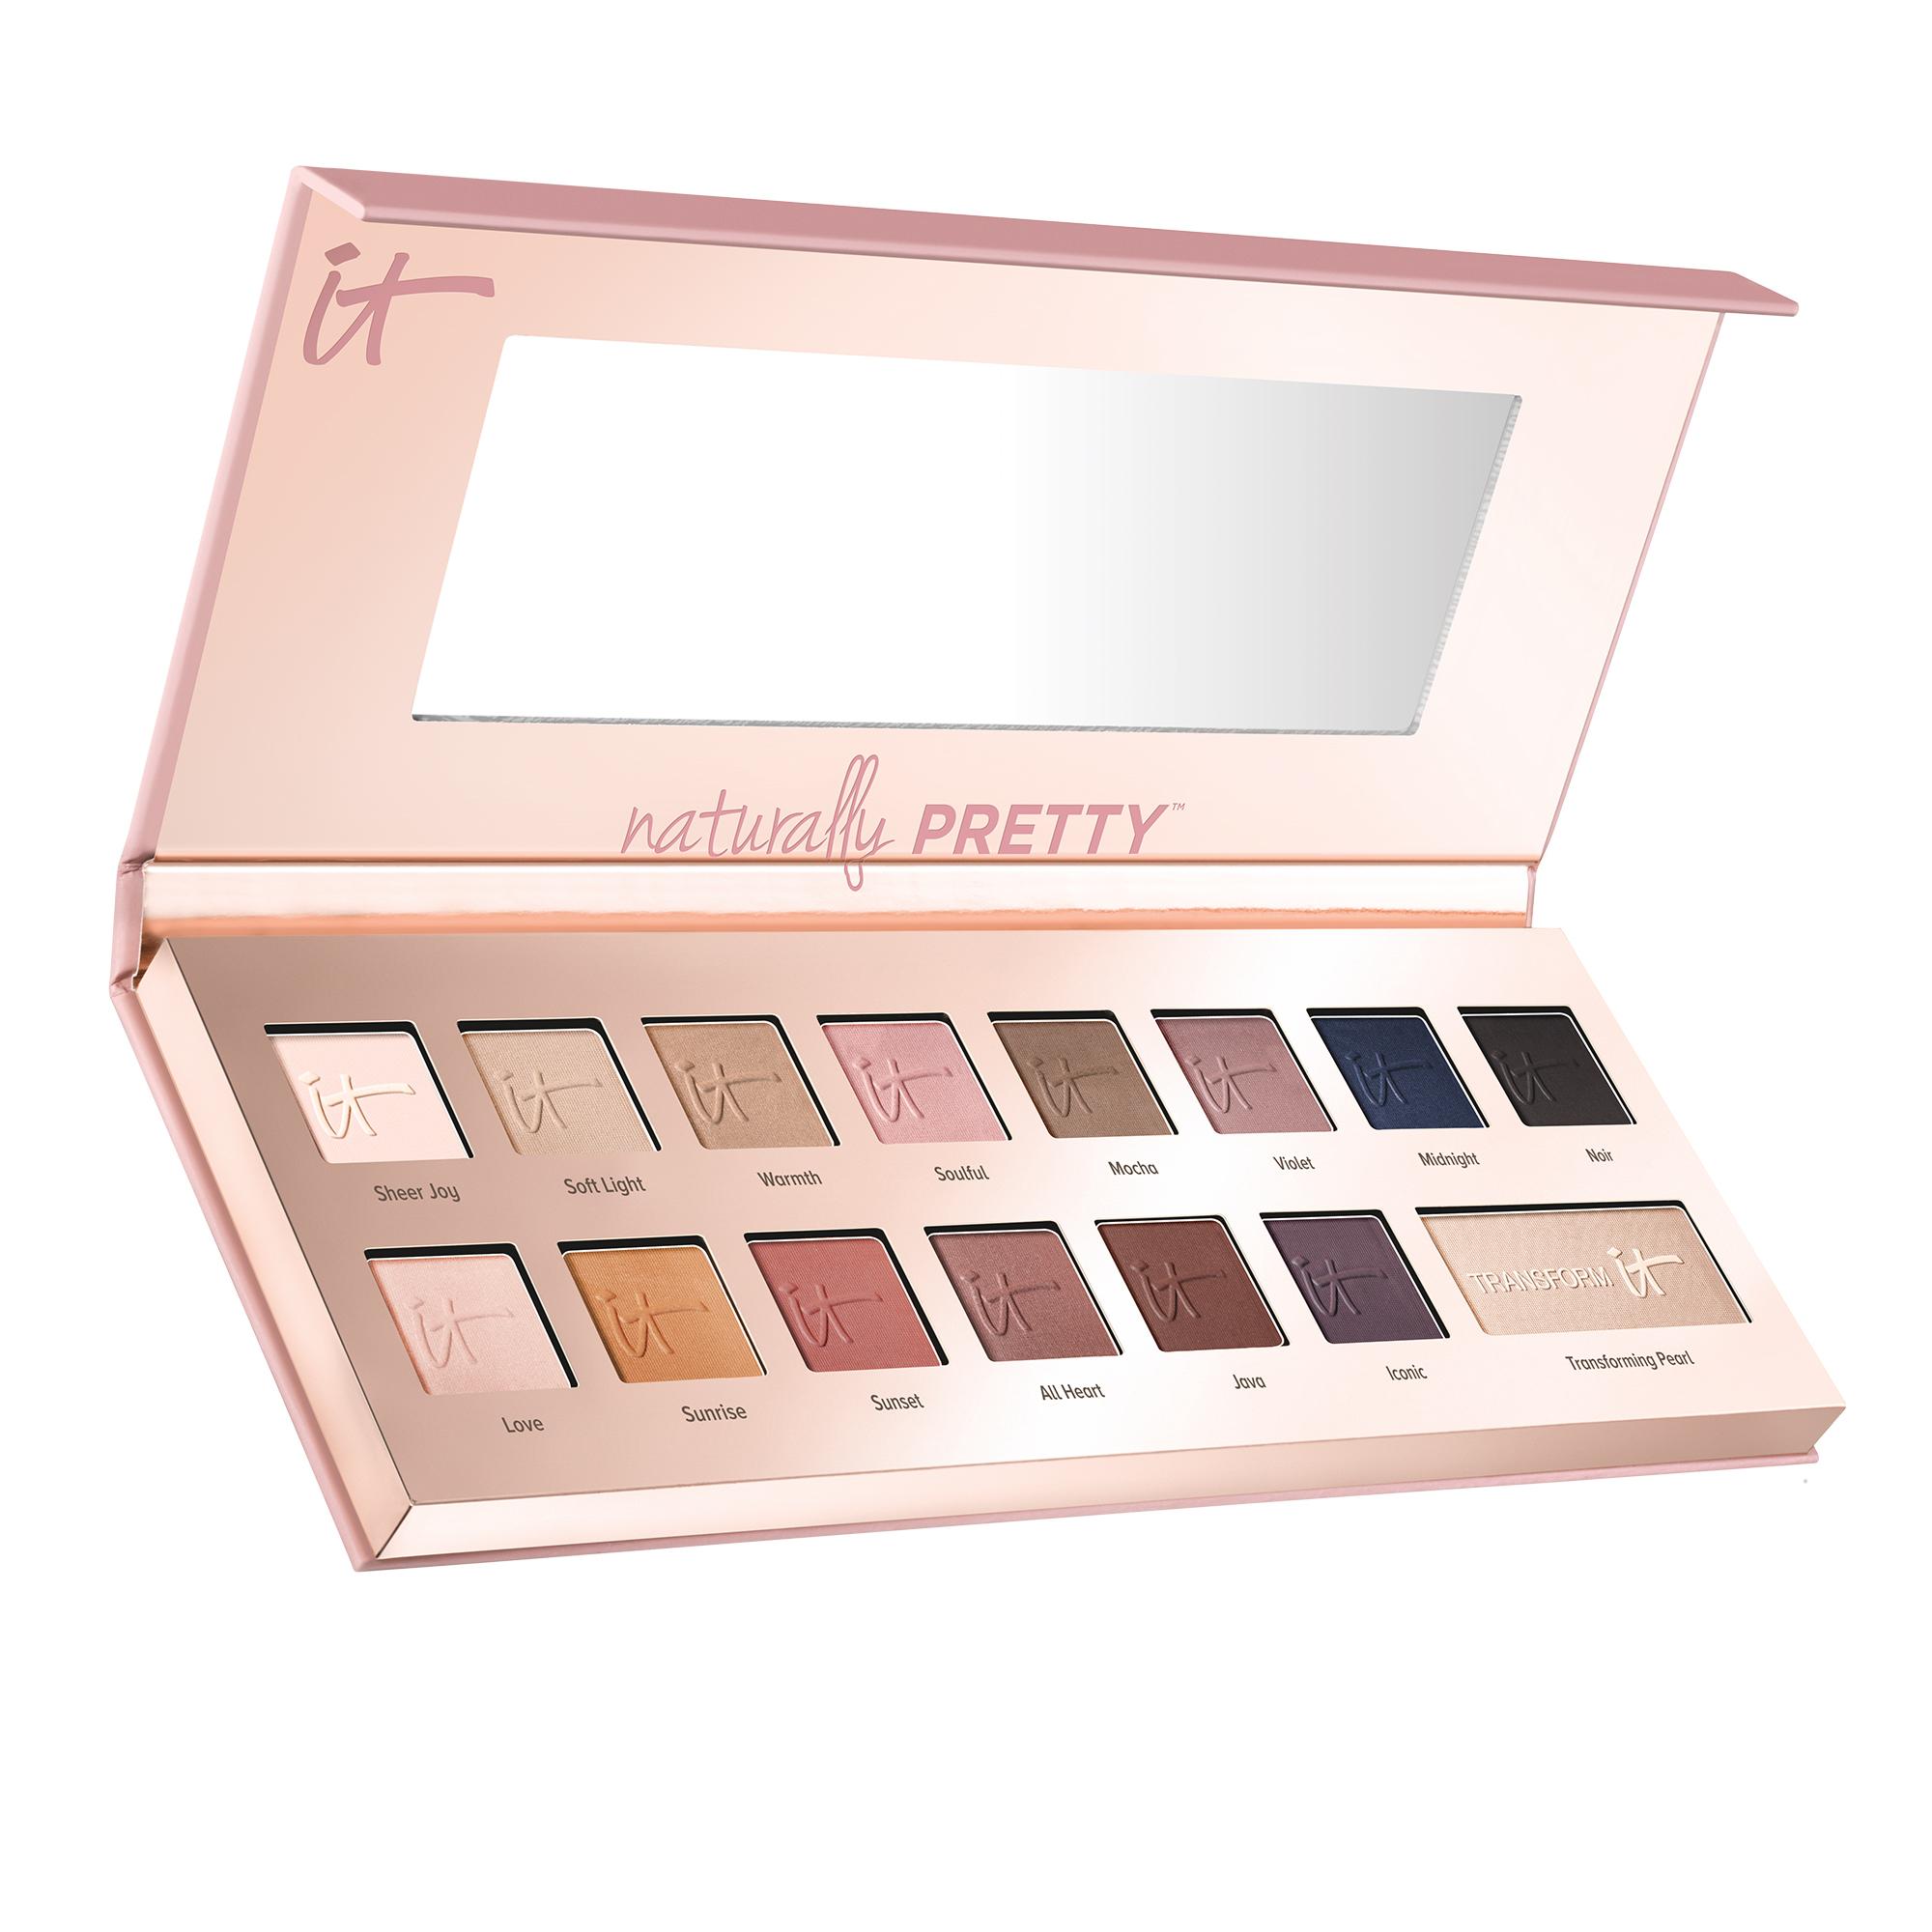 Naturally Pretty™ Eyeshadow Palette